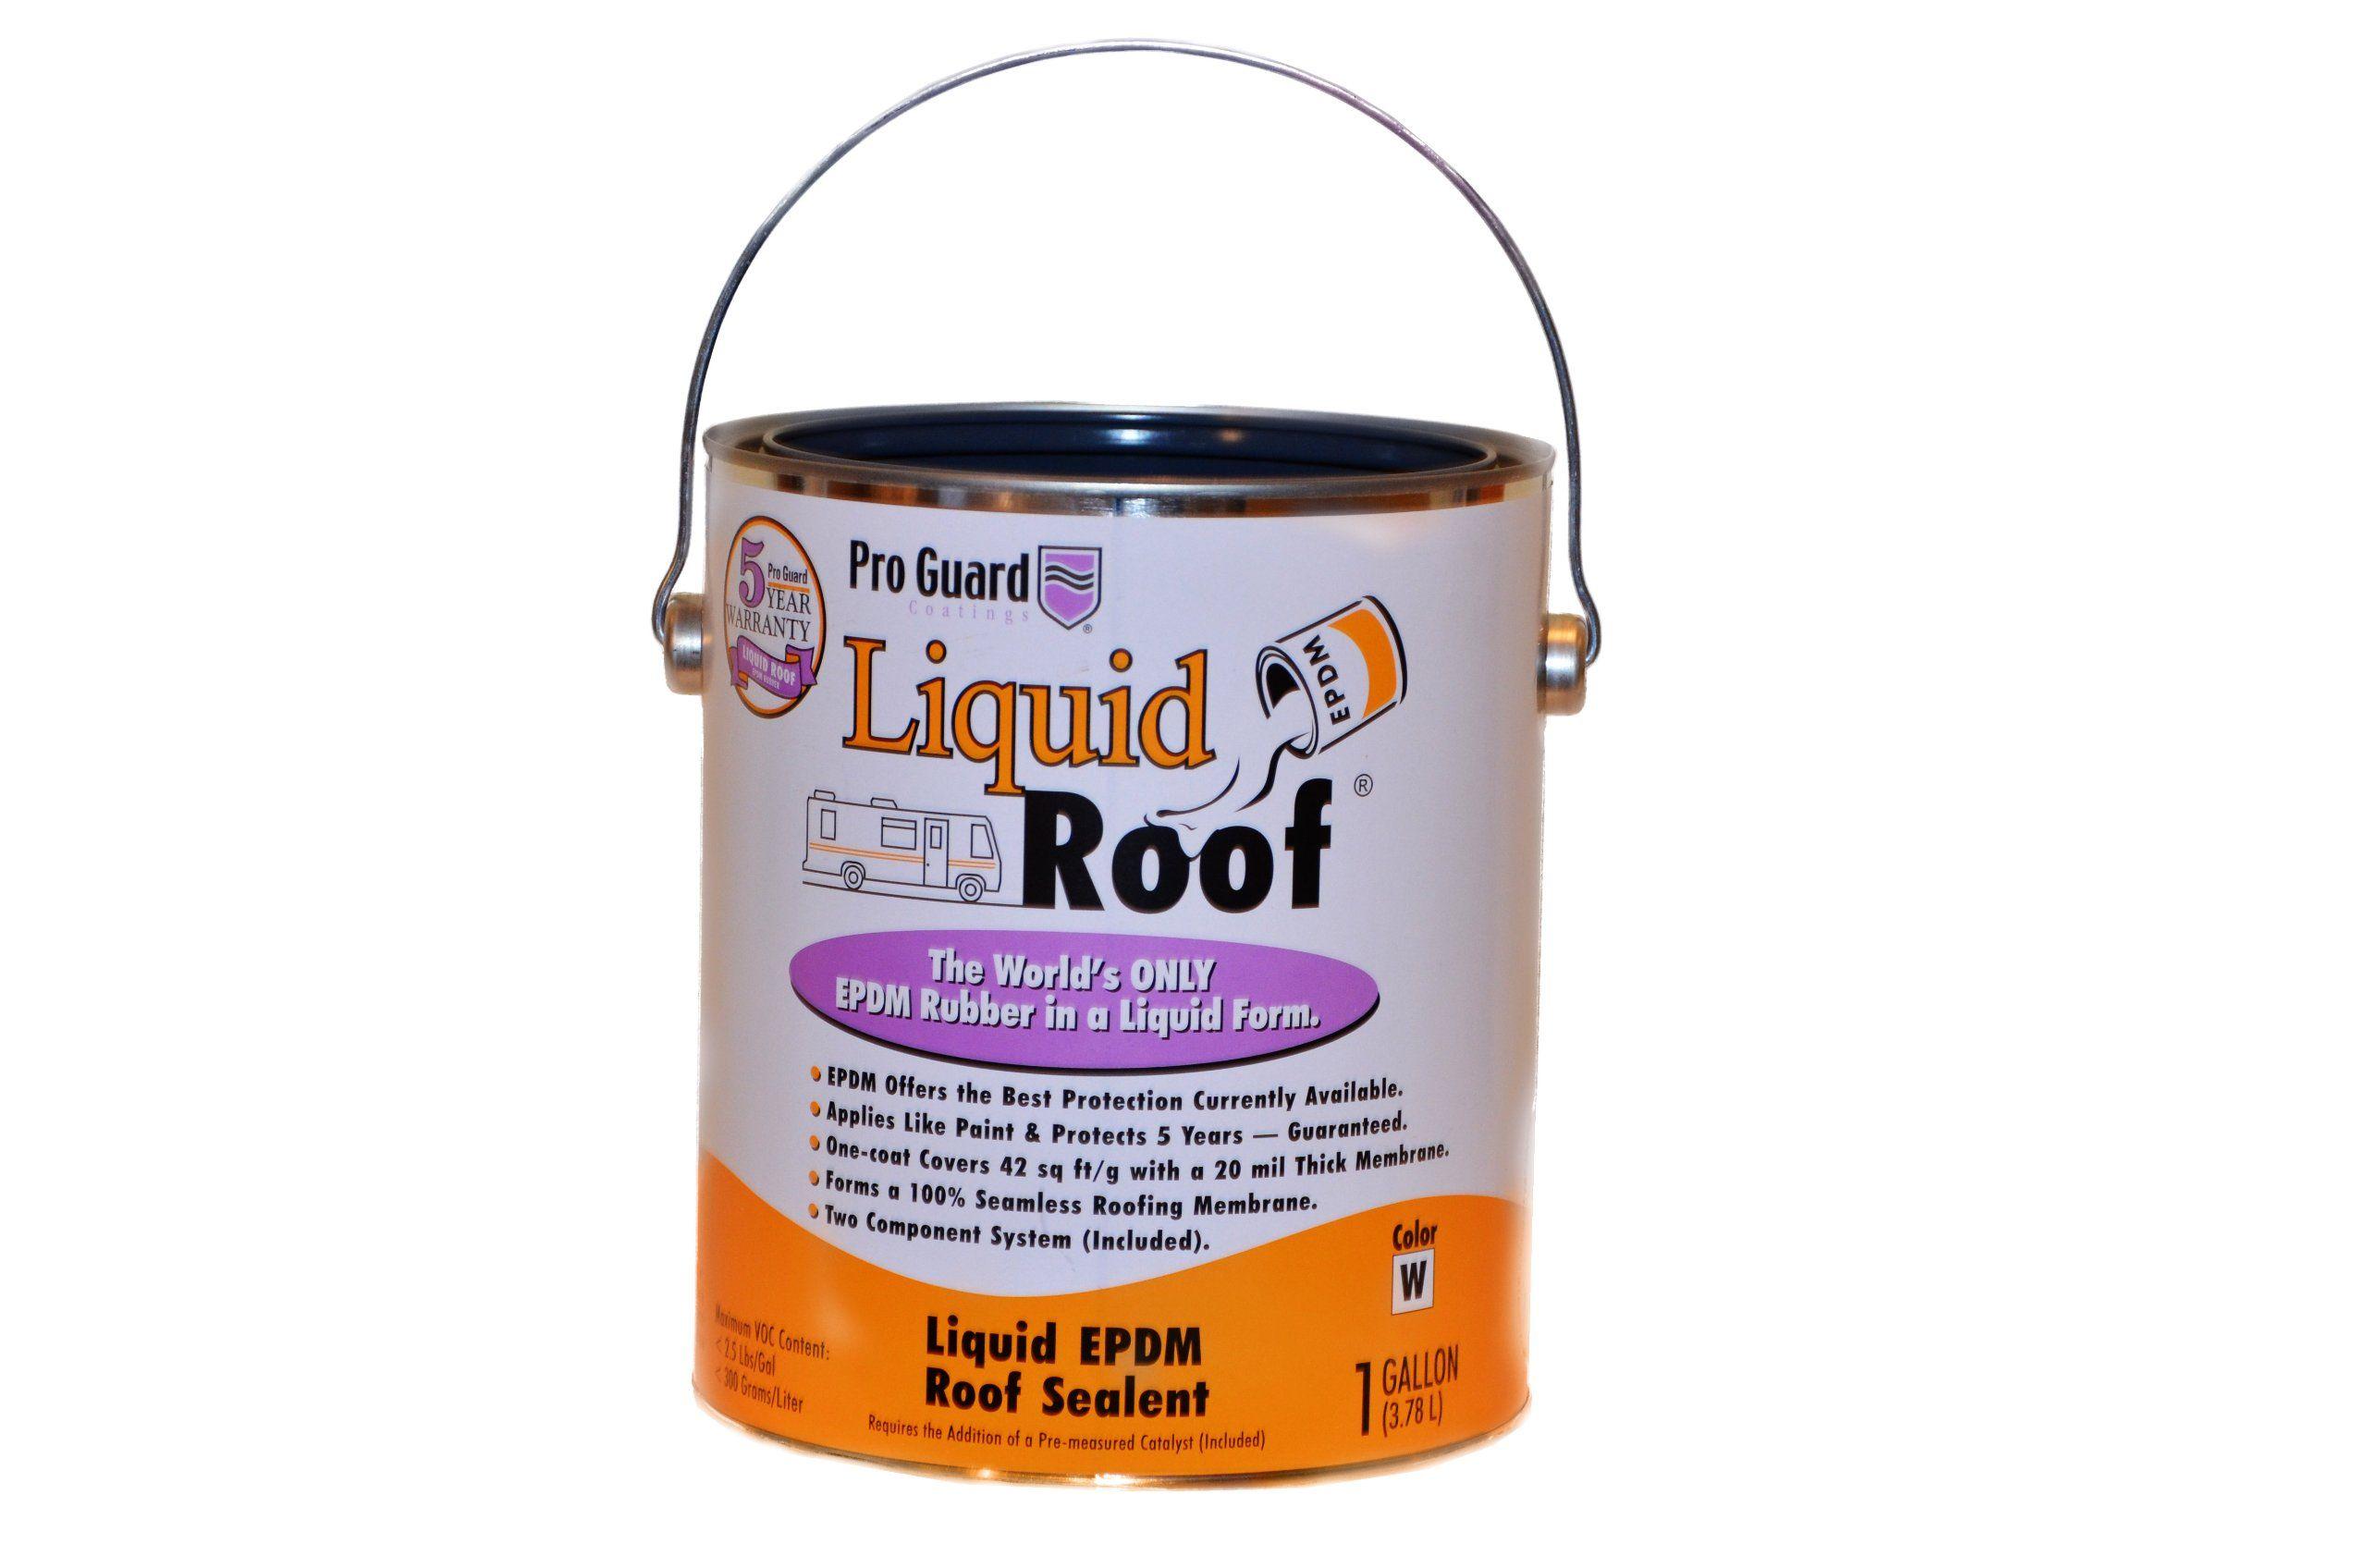 Liquid Roof Rv Roof Coating Repair 1 Gallon Wall Surface Repair Products Amazon Com Liquid Roof Roof Repair Diy Roof Coating